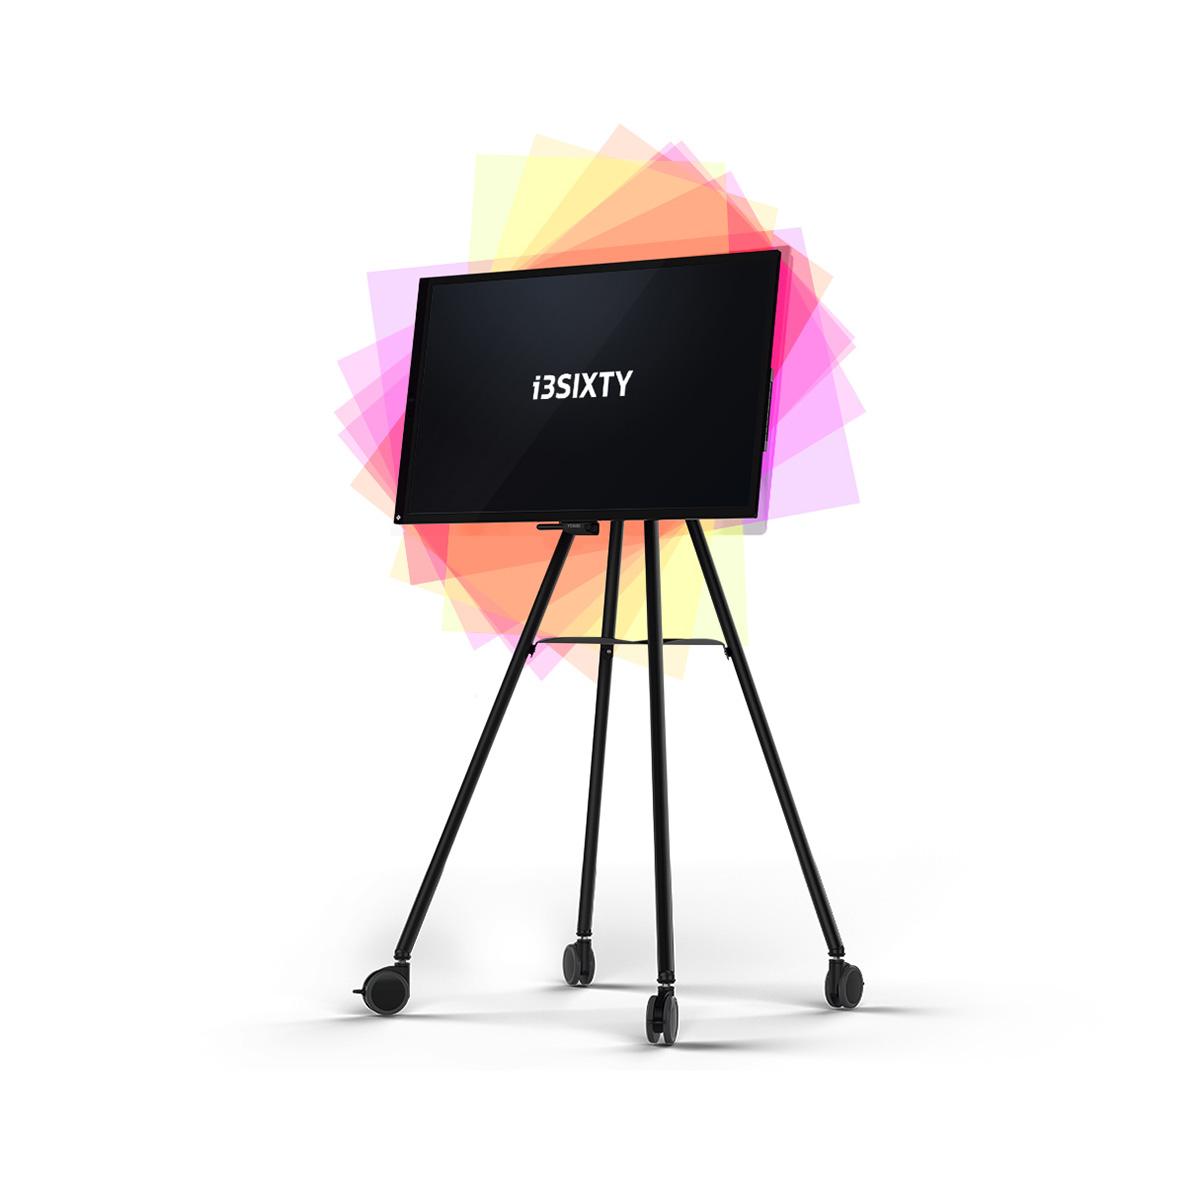 i3TOUCH i3SIXTY mobiles interaktives Whiteboard auf Rollen